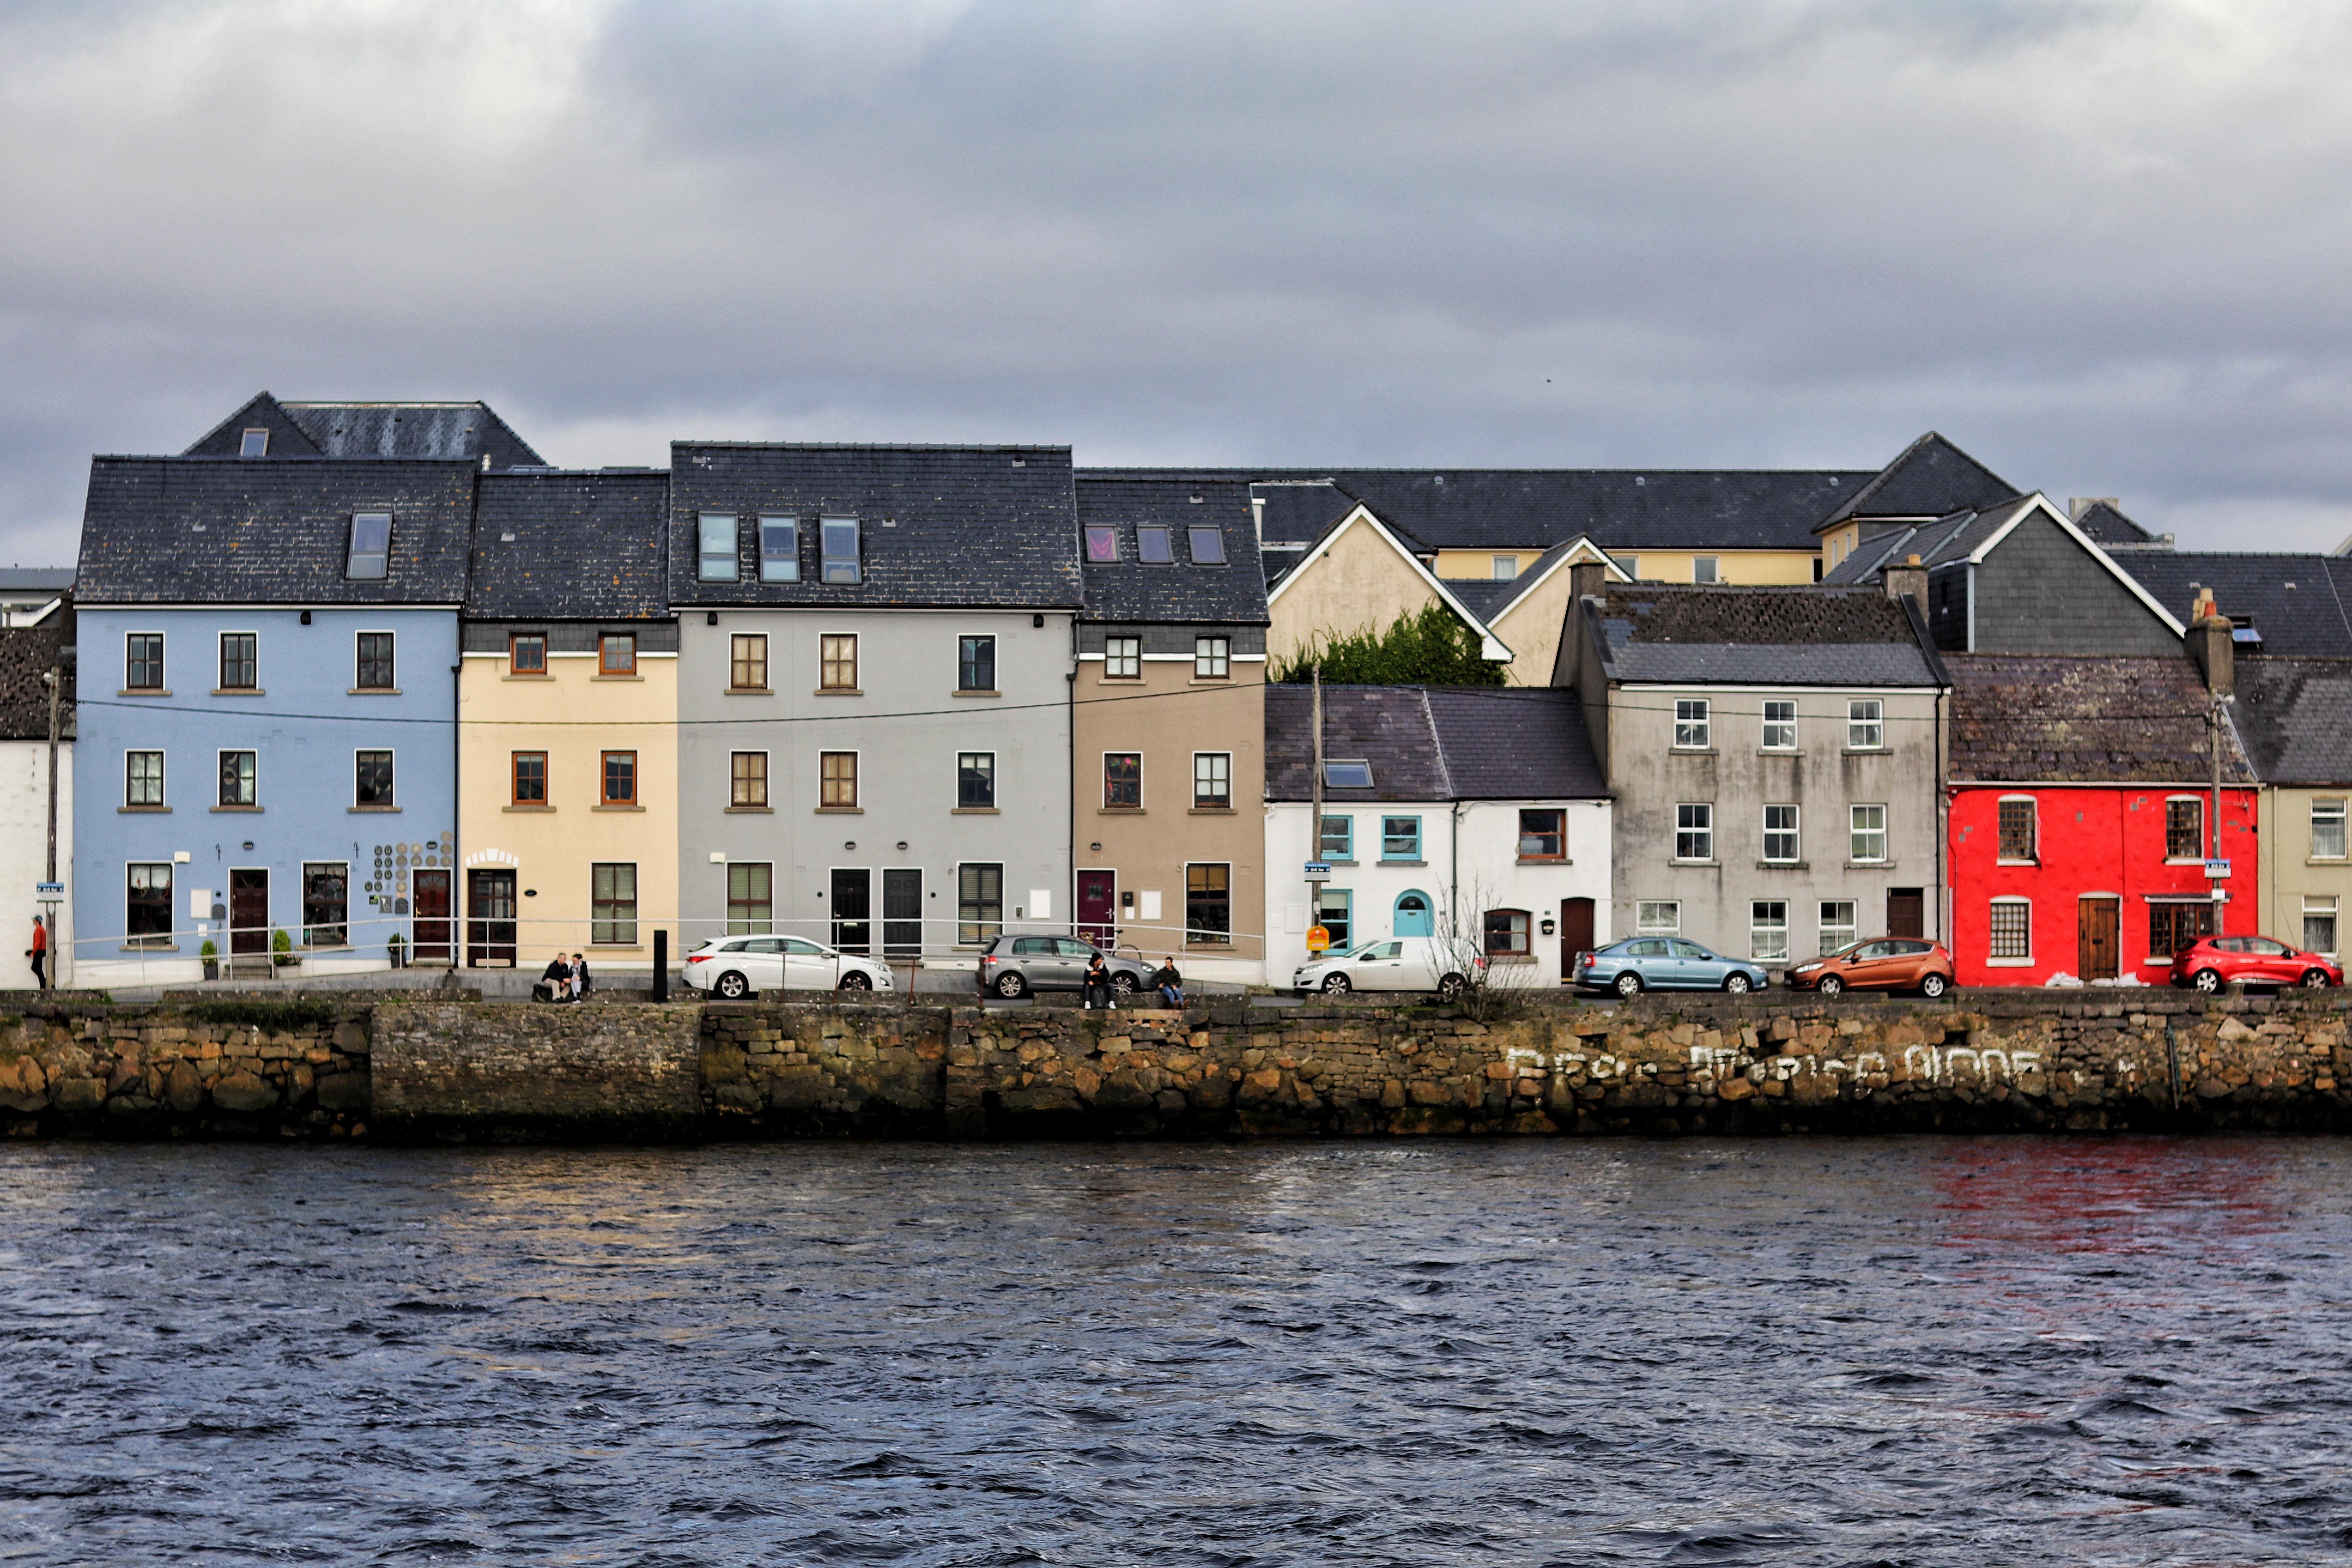 photo of buildings in Galway, Ireland